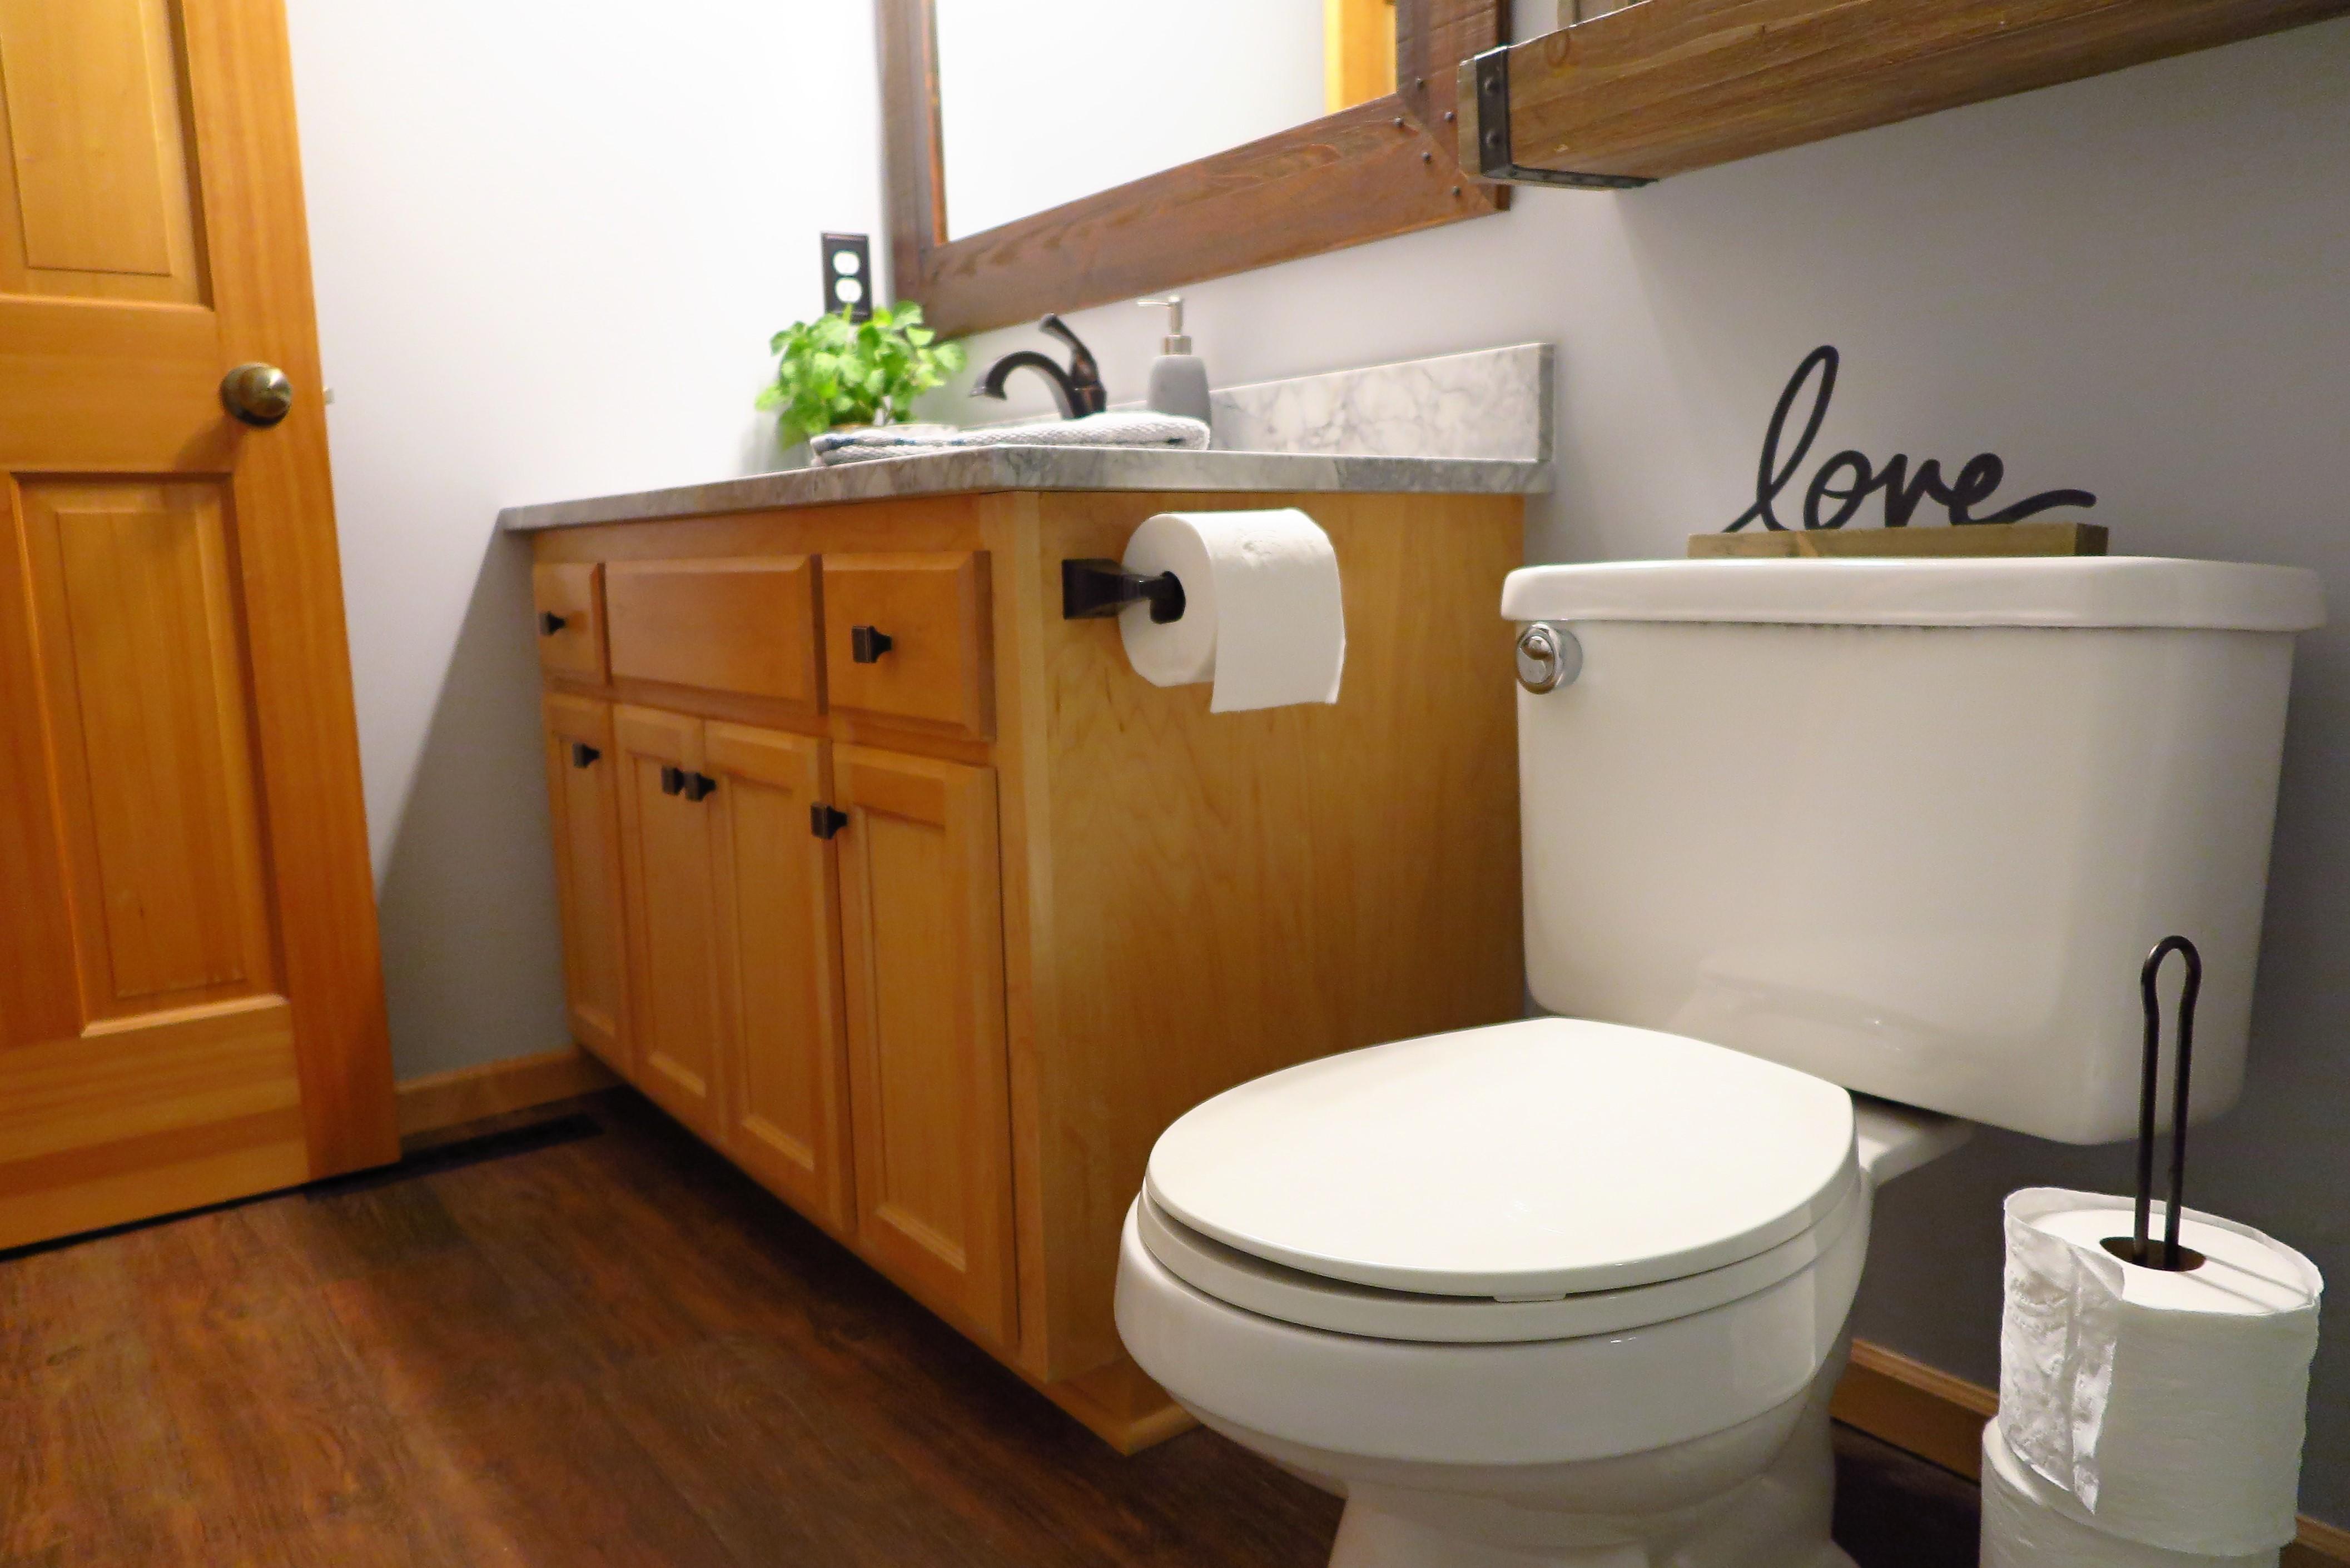 Farmhouse Inspired Bathroom Remodel | Woodbury, MN - White ...